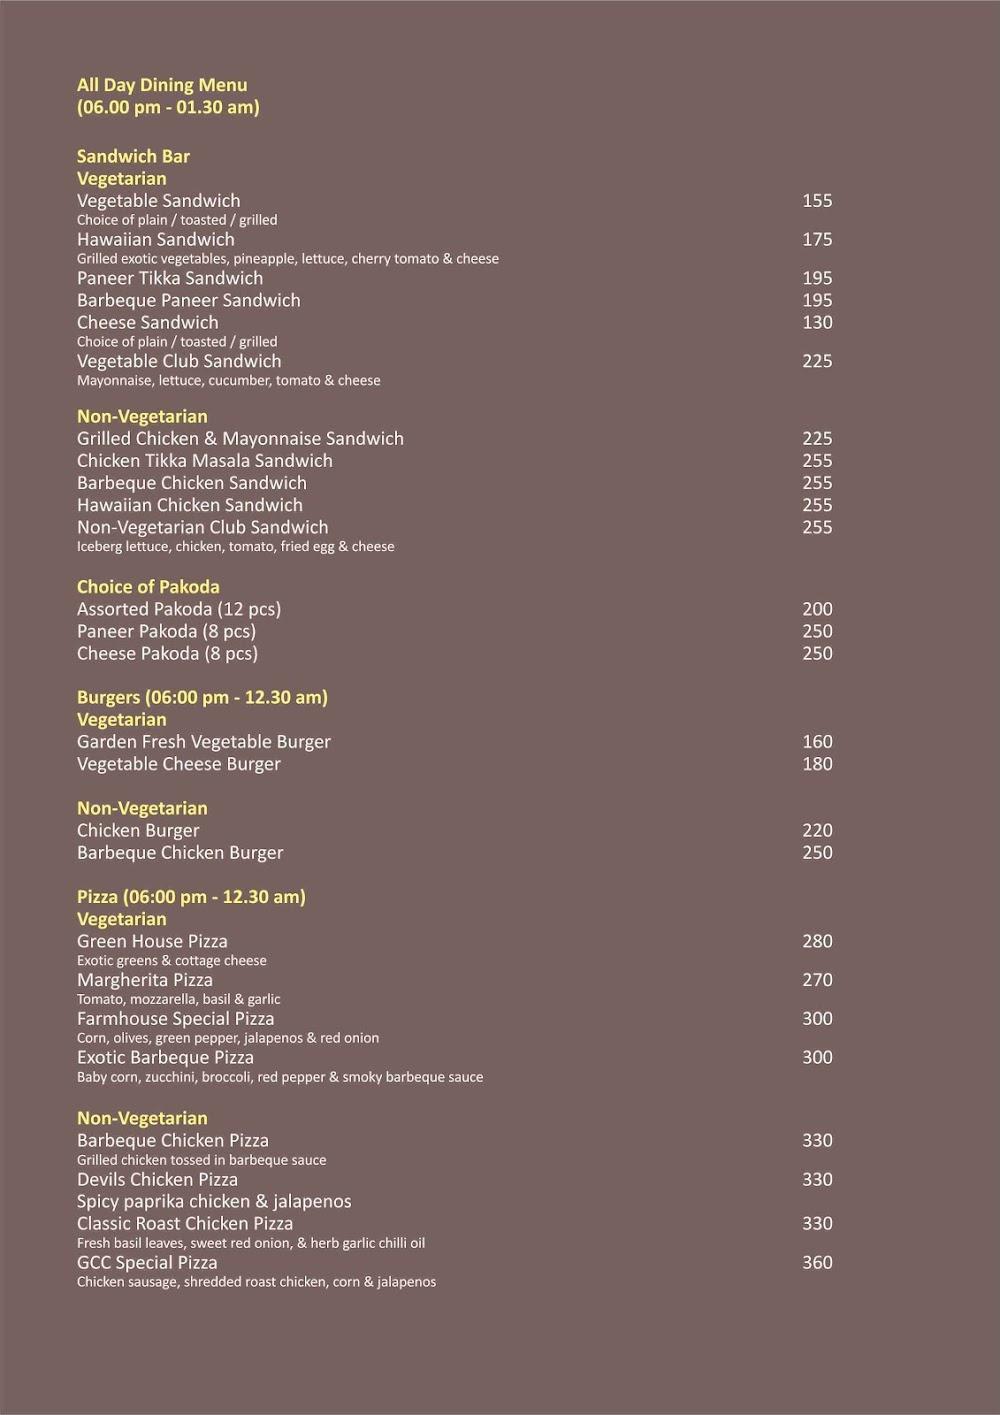 The Oaks - Lounge & Bar - GCC Hotel & Club menu 2